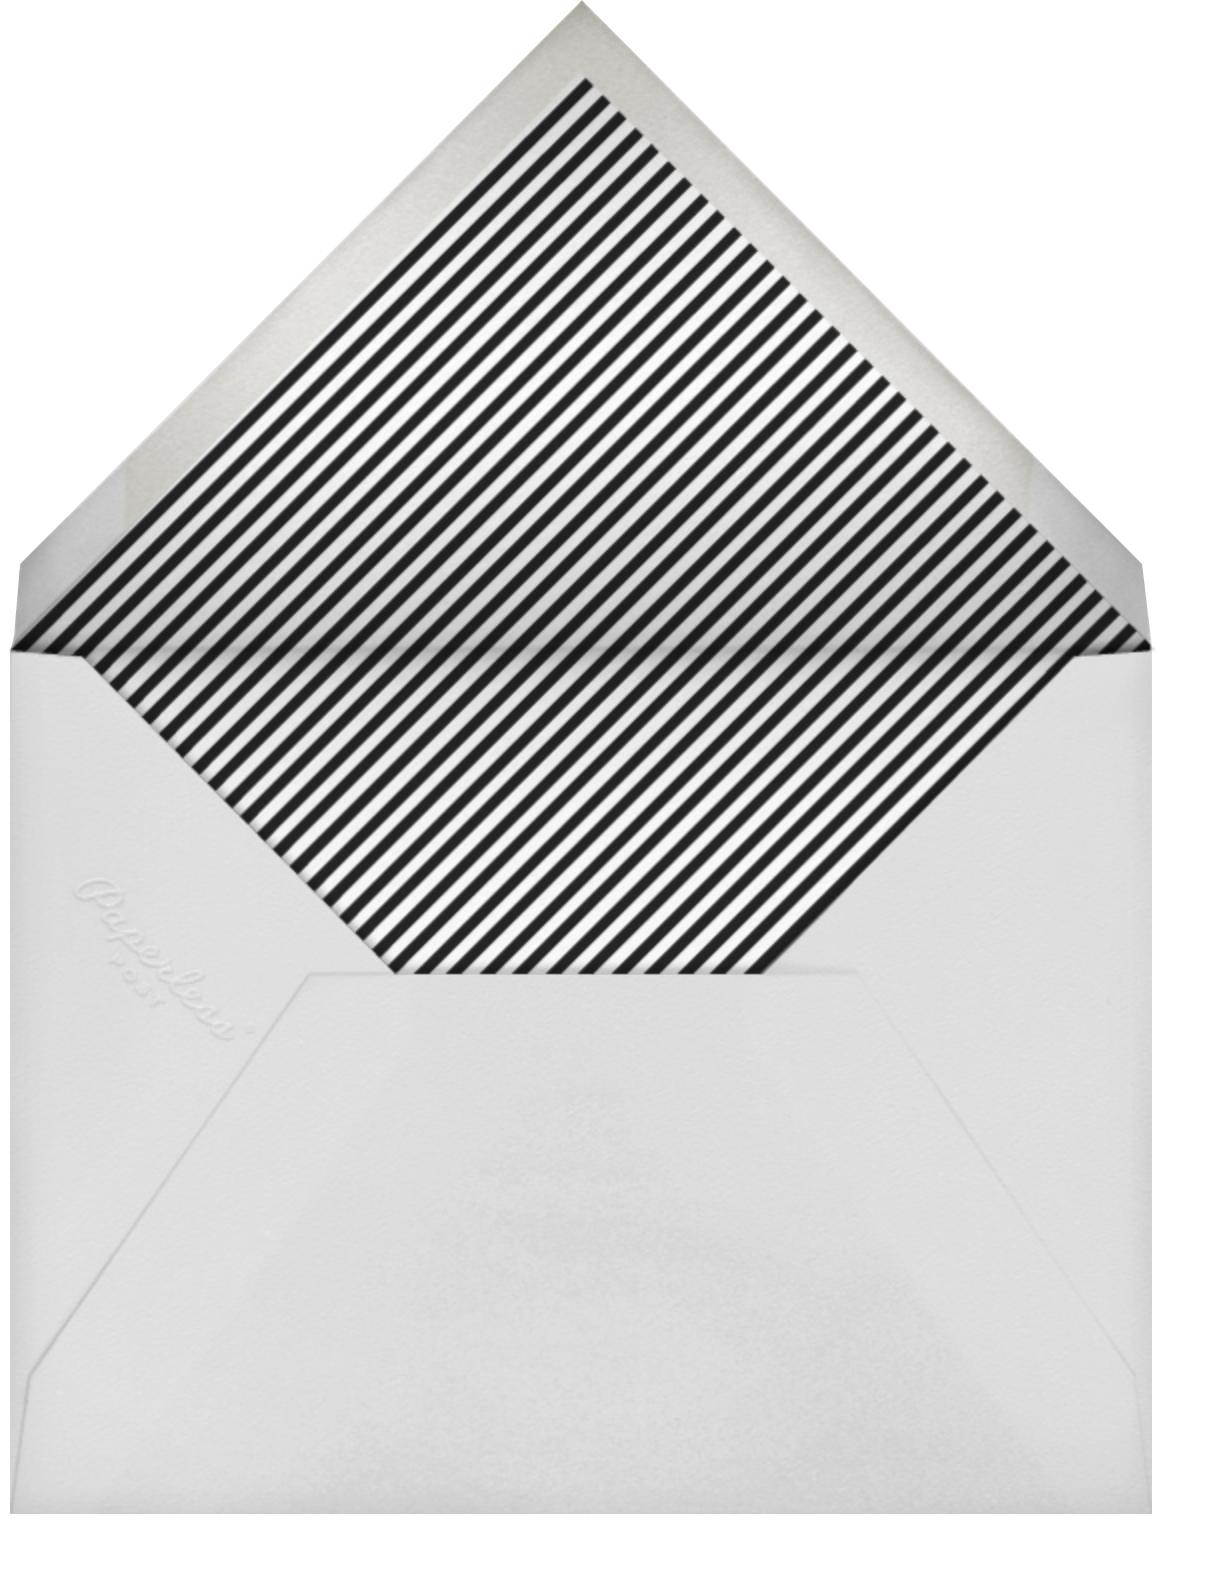 The Tassel - Japanese Mix - Mr. Boddington's Studio - Graduation party - envelope back